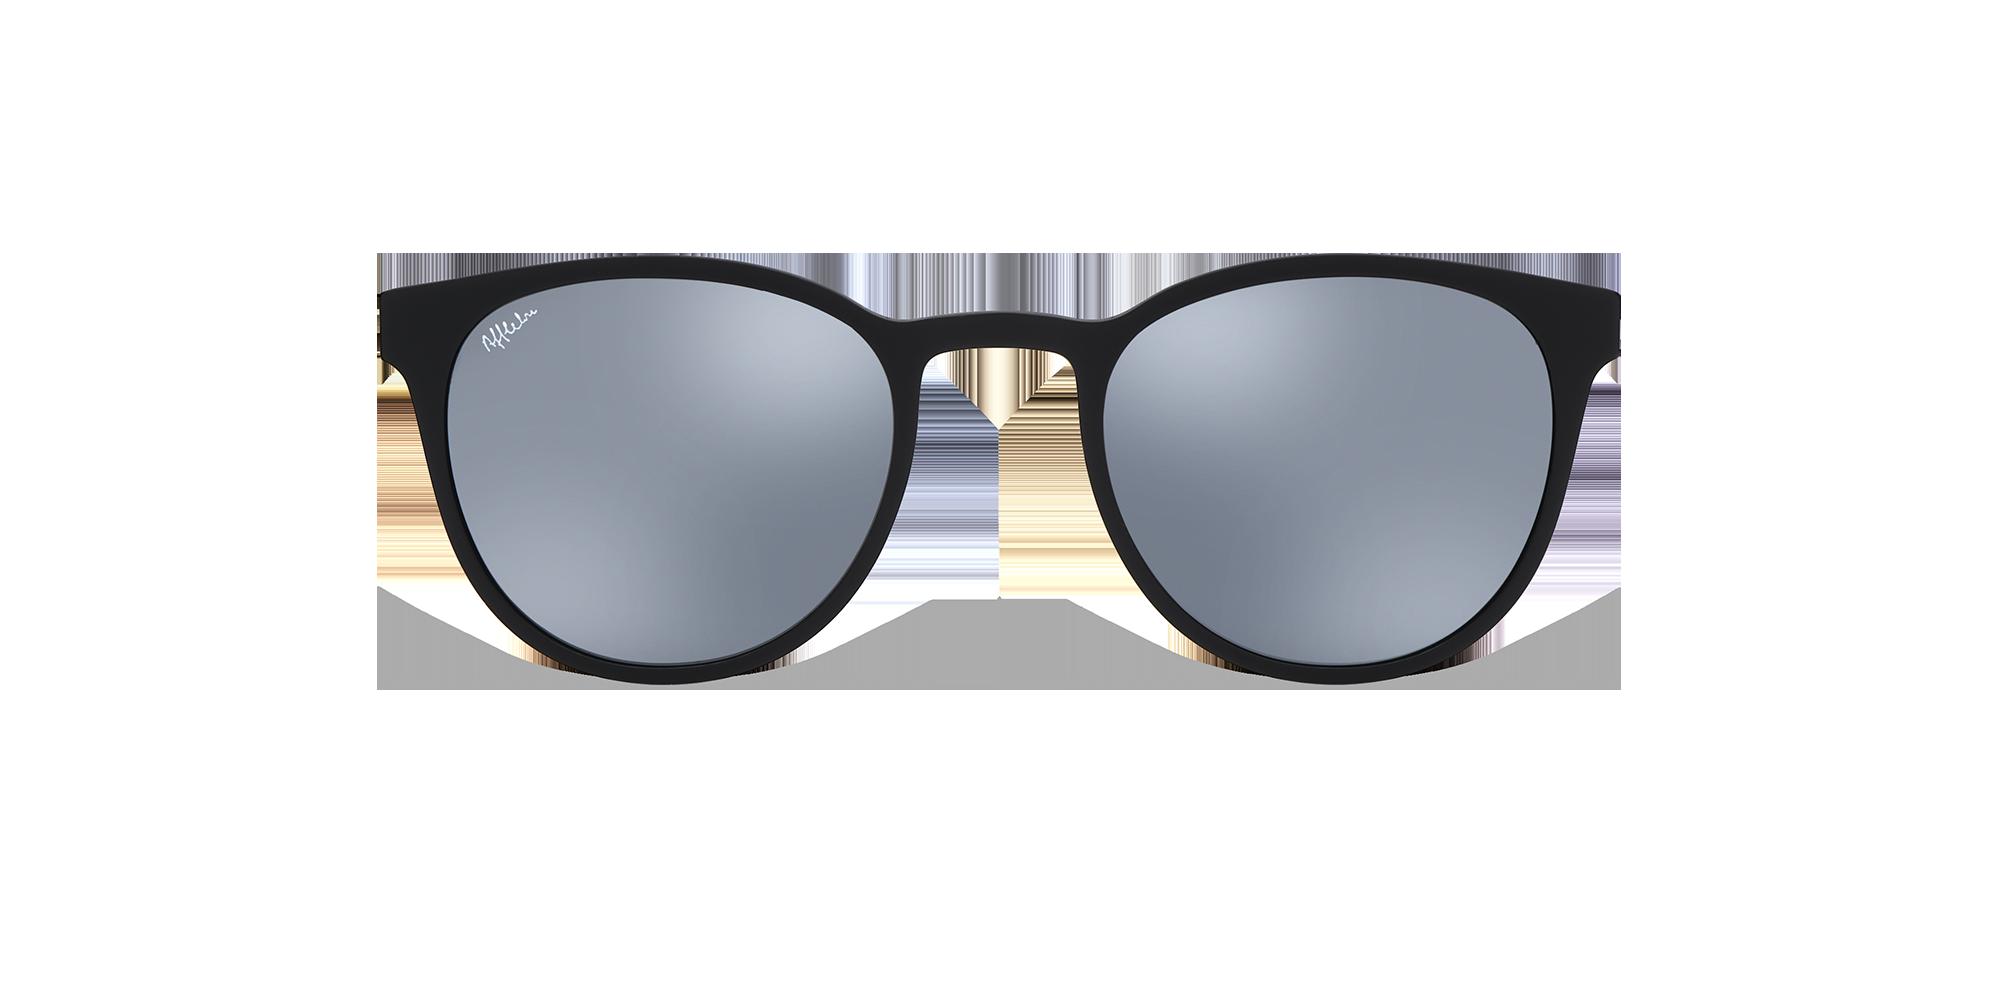 afflelou/france/products/smart_clip/clips_glasses/TMK44PRBK014920.png